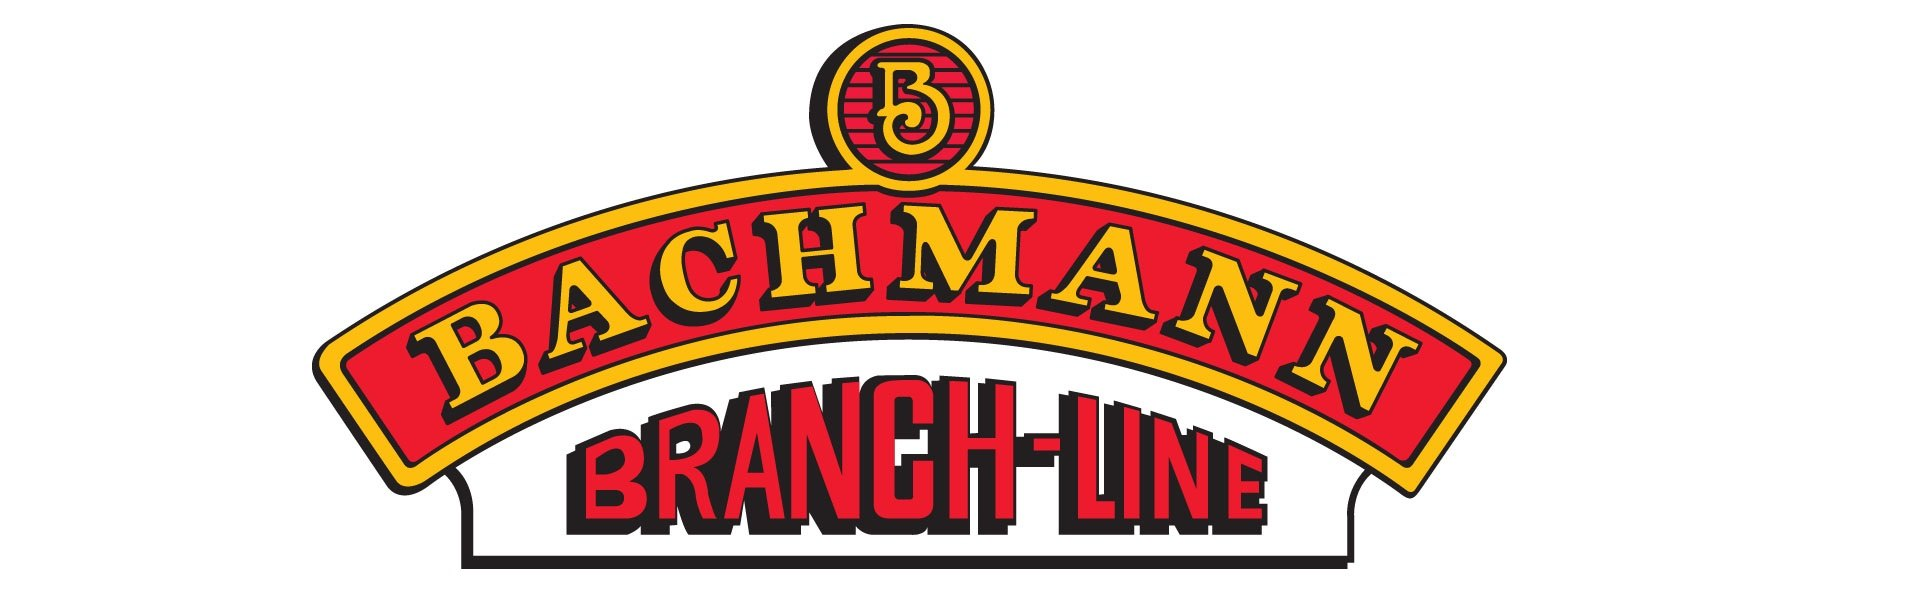 Bachmann Branchline Spring 2020 - New Range Now Live